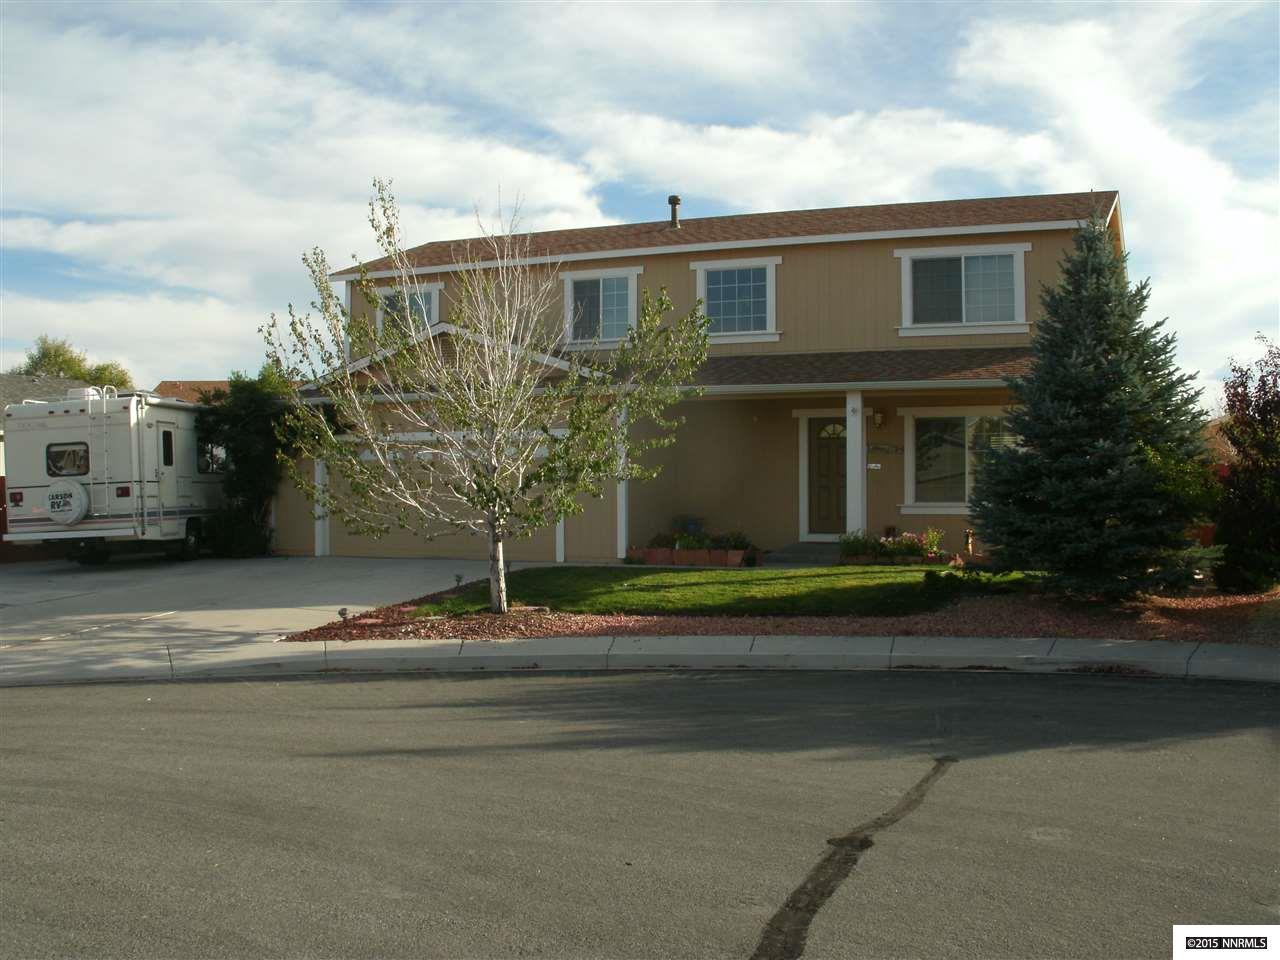 17930 Blue Creek Ct, Reno, NV